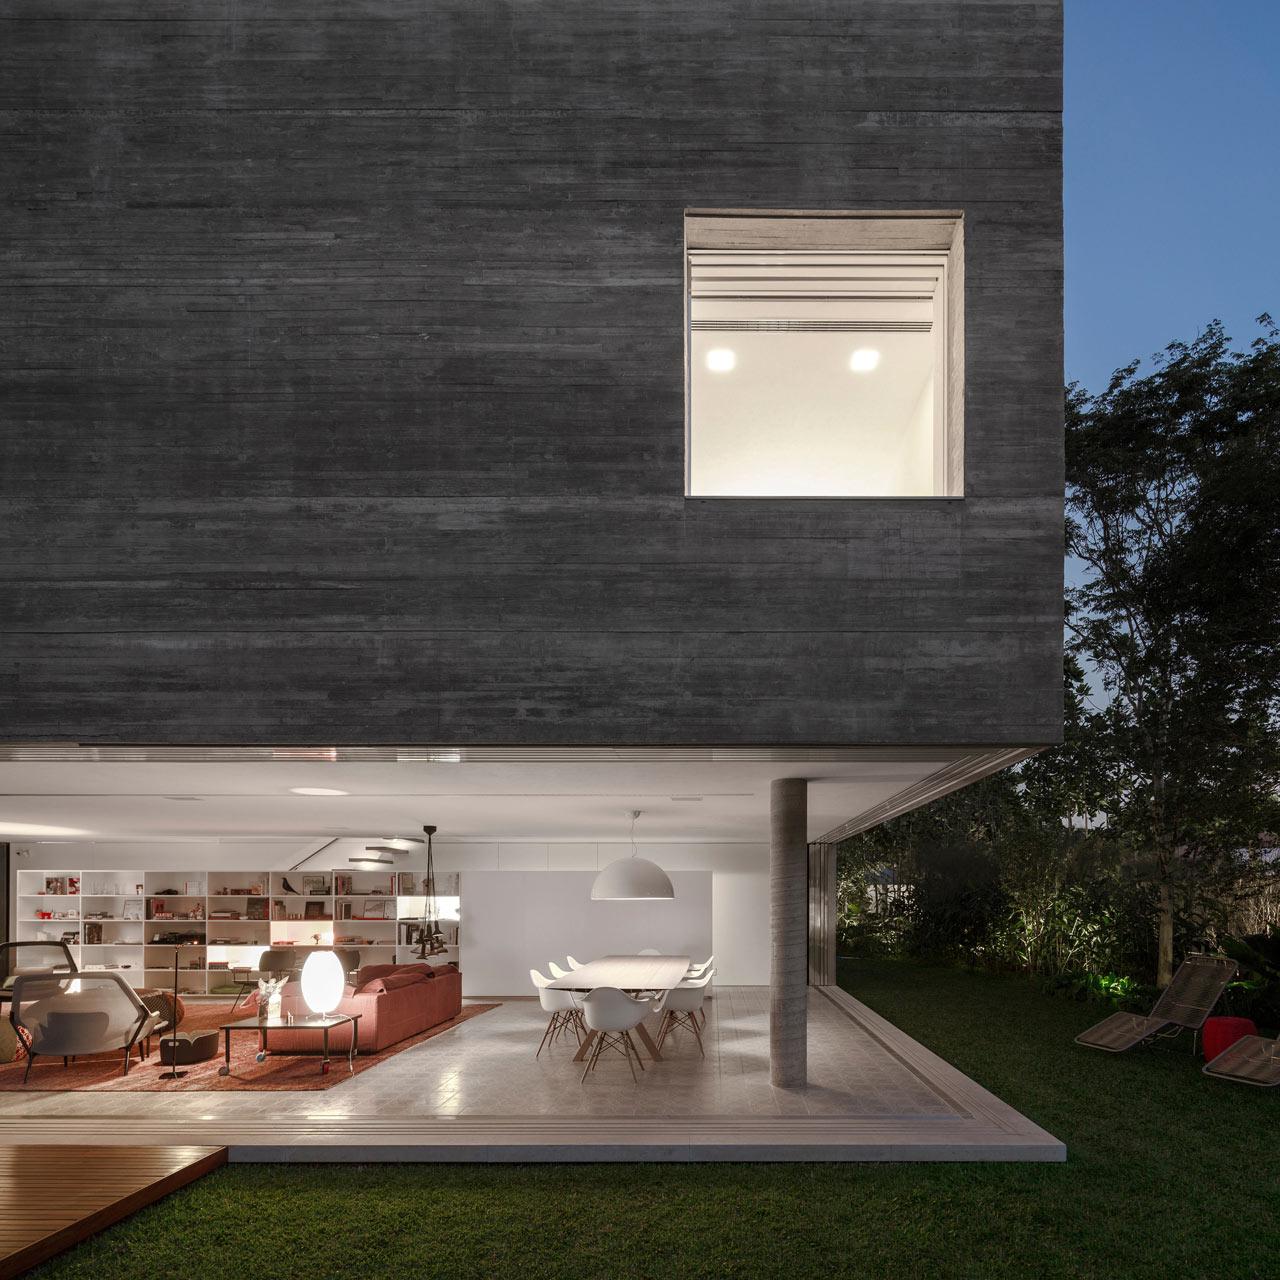 2013 Award Winning House Plans: The Best In Design: A' Design Award Winners 2013